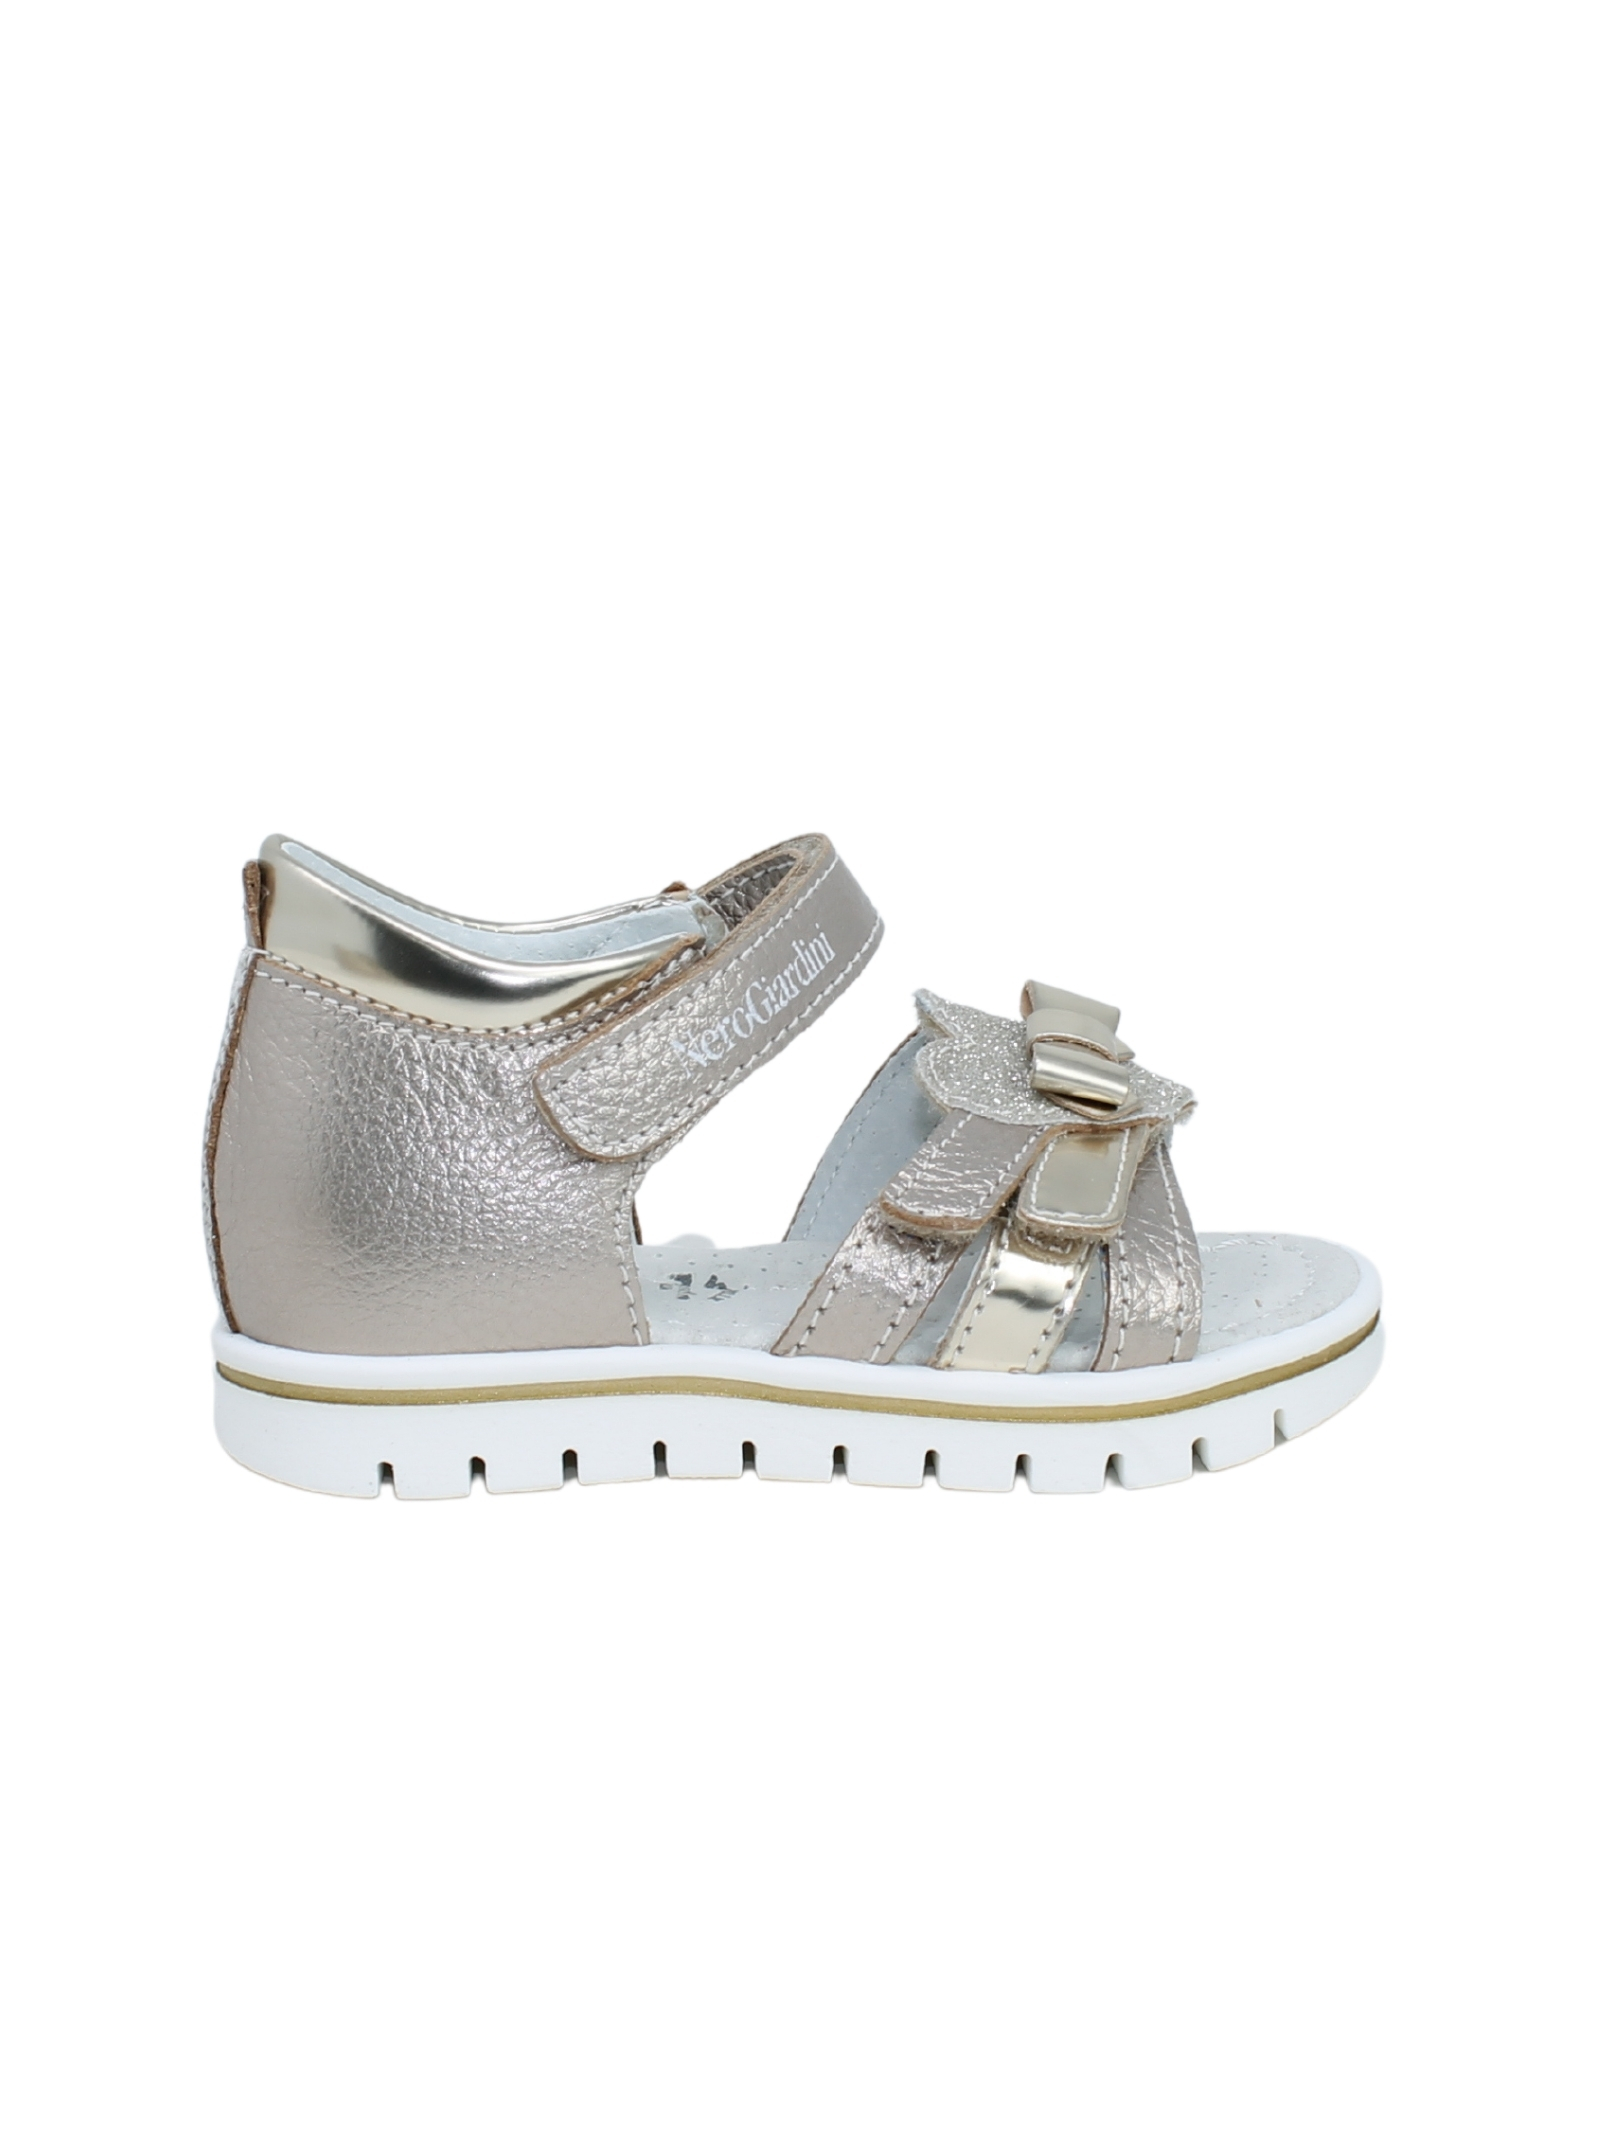 Sandalo Bambina Platino NERO GIARDINI JUNIOR | Sandali | E021473F672